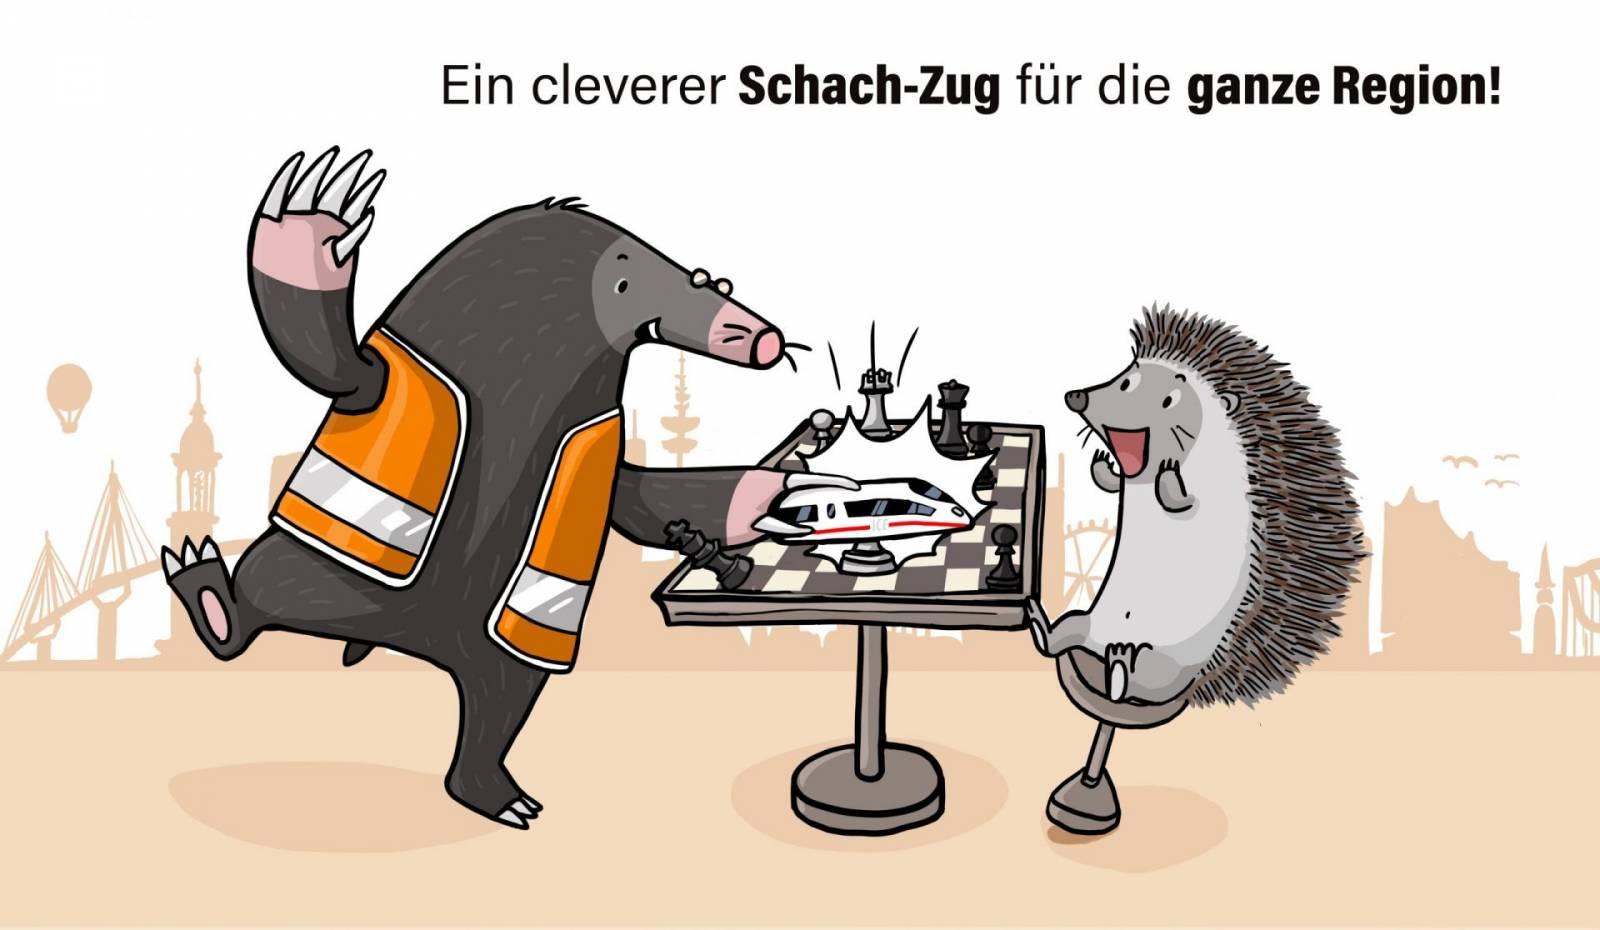 Maulwurf Schachzug Illustration Bahn